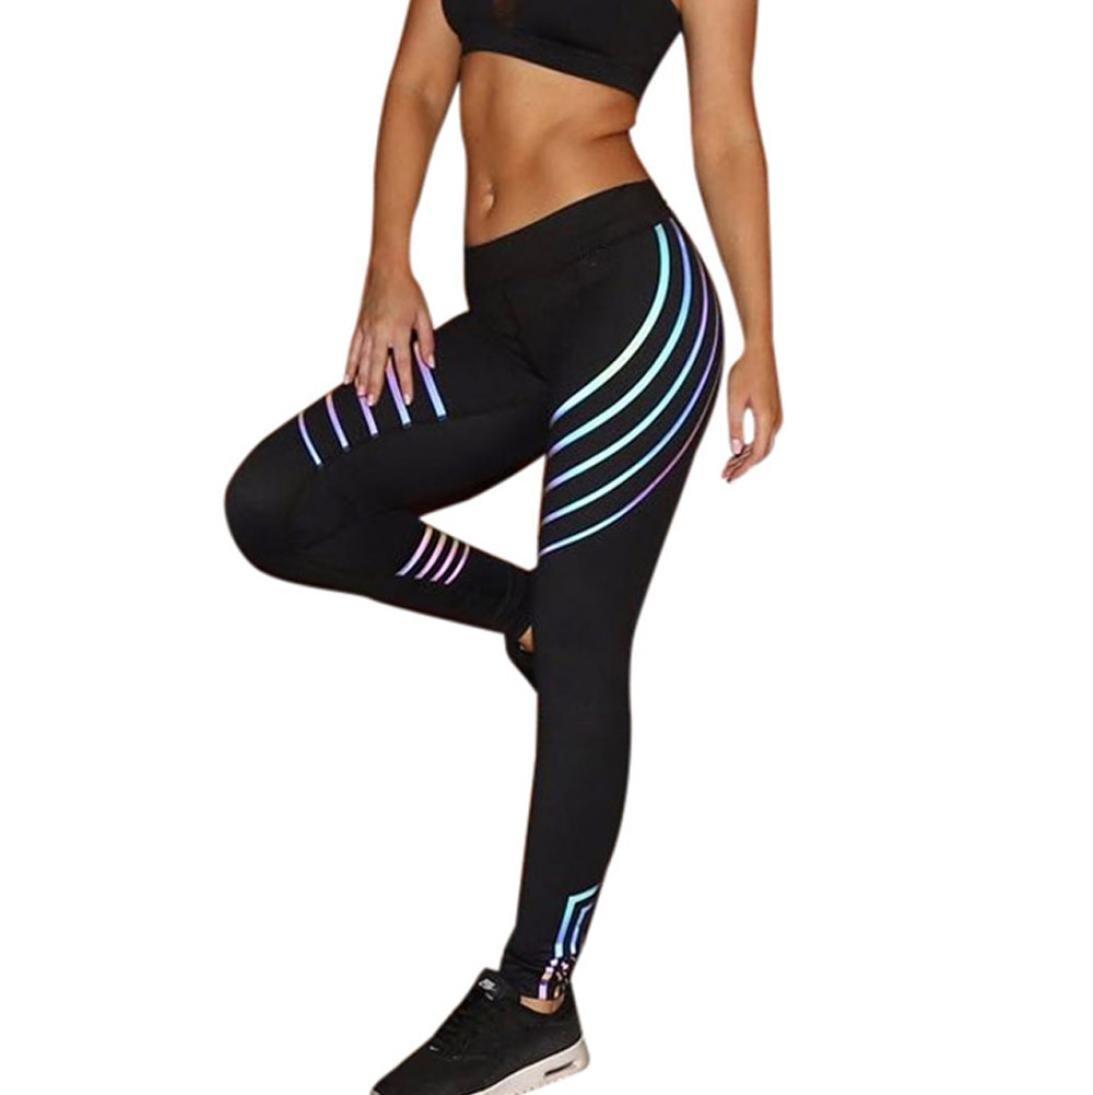 Pantalones deporte mujer largos tallas grandes, pantalones chandal mujer anchos de alta cintura leggings deportivos